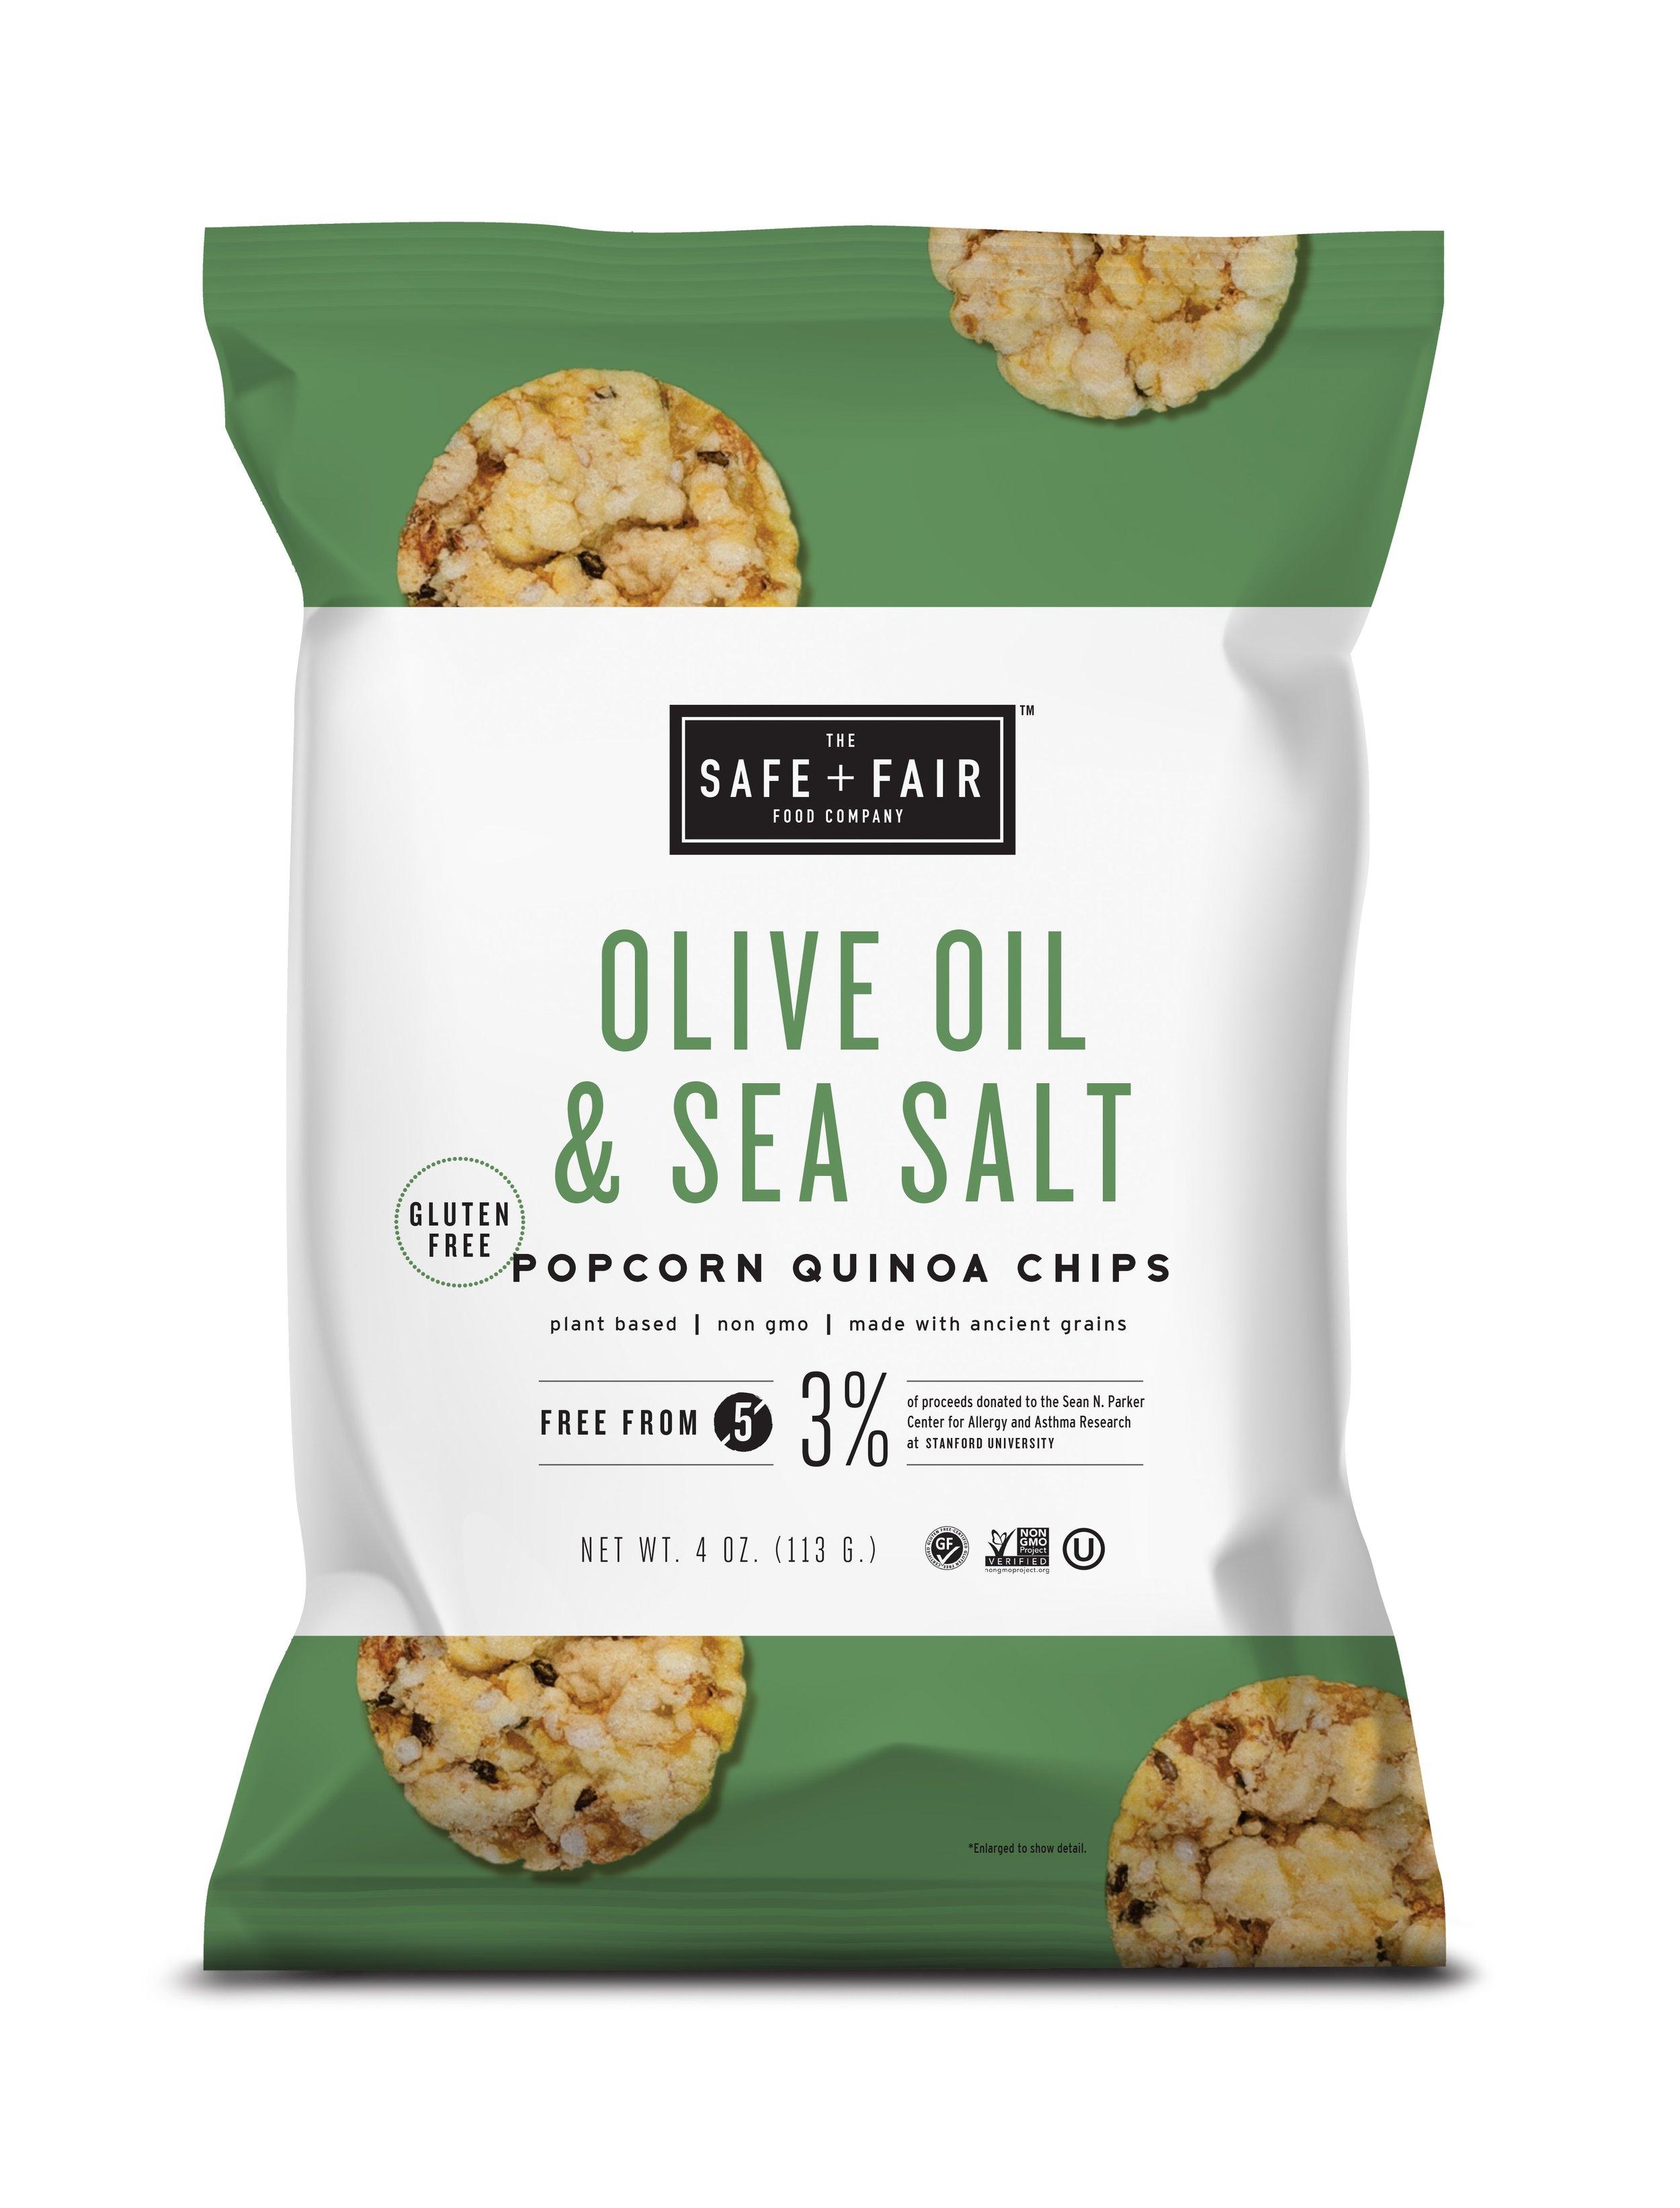 PopcornQuinoaChips_OliveOilSeaSalt_Front.jpg